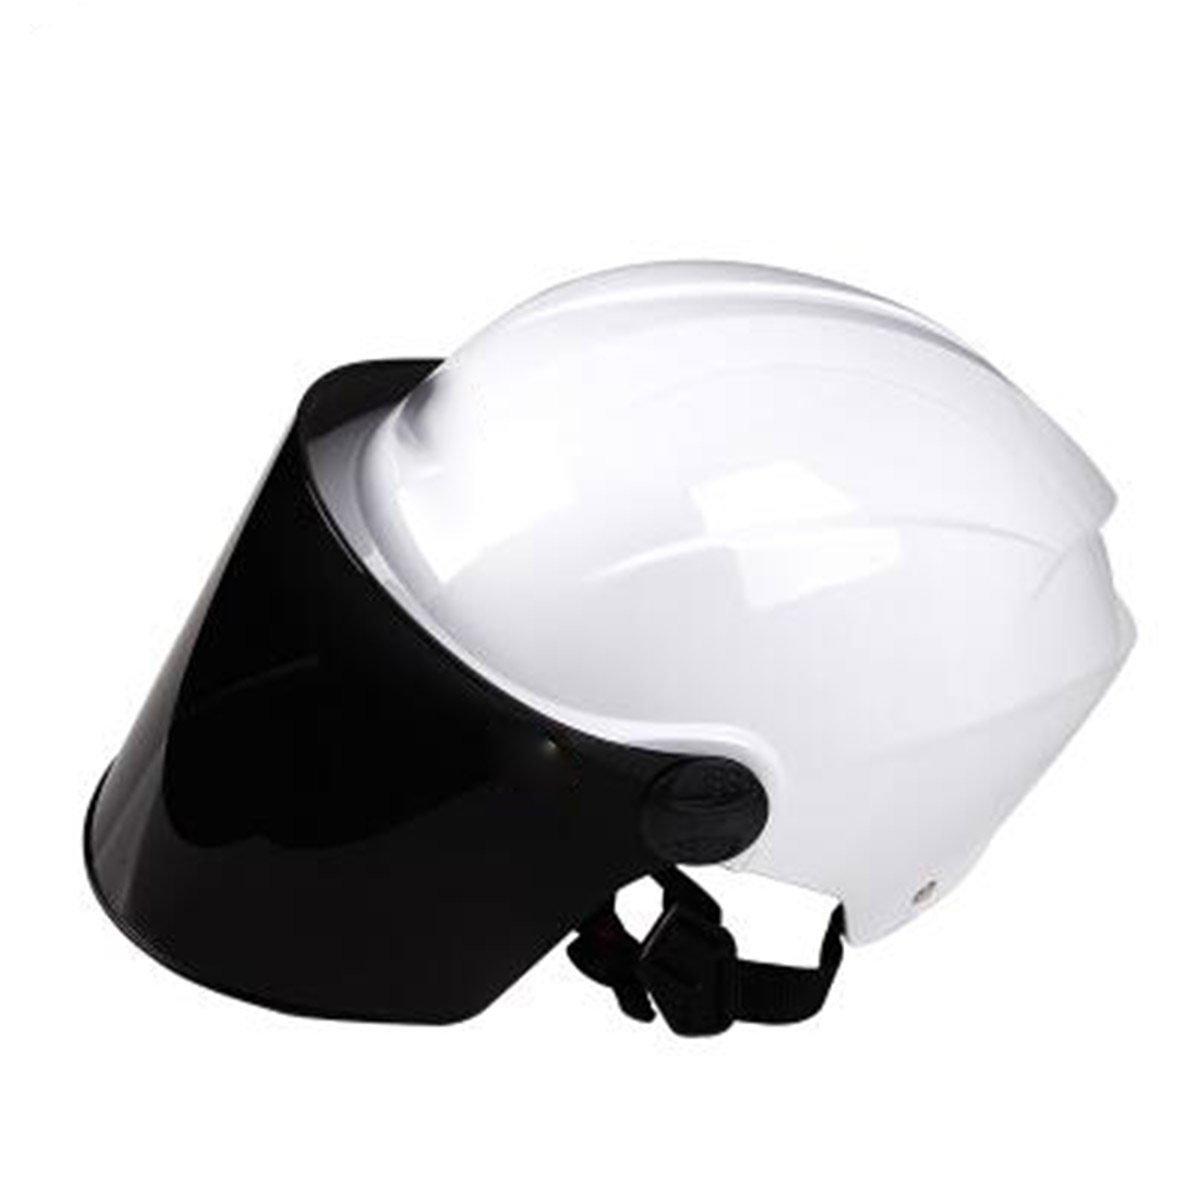 TZQ Half-coveROT Electric Car Spring Breeze Schutzbrillen Herren Damen Helme Schutzbrillen Breeze Helme e8f7f8